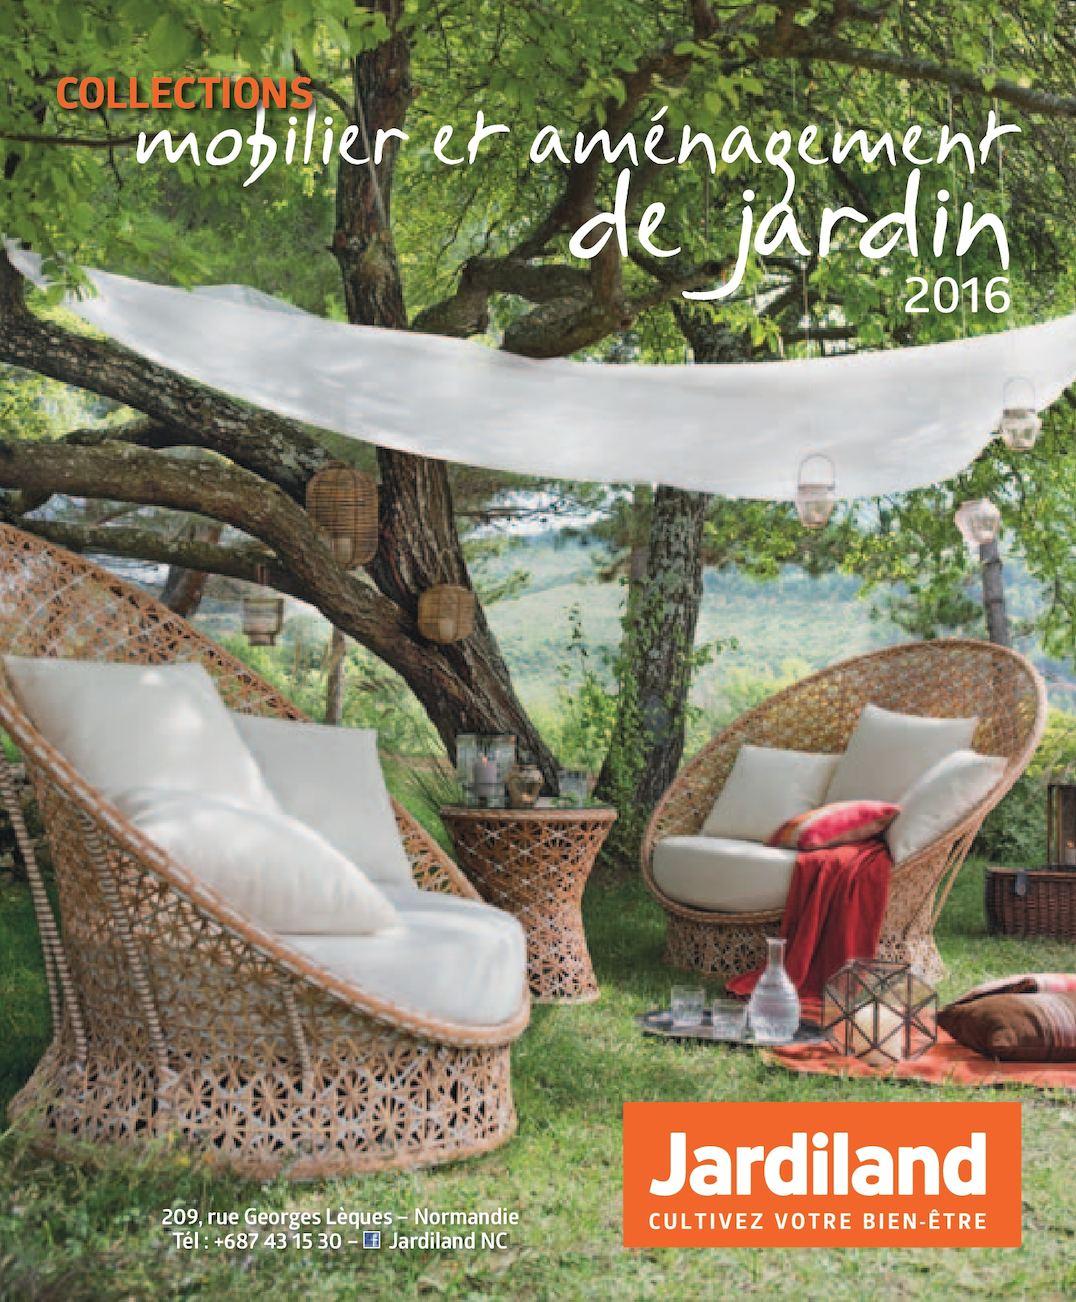 Calaméo - Catalogue Été 2016 Jardiland Nouvelle-Calédonie concernant Table De Jardin Aluminium Jardiland